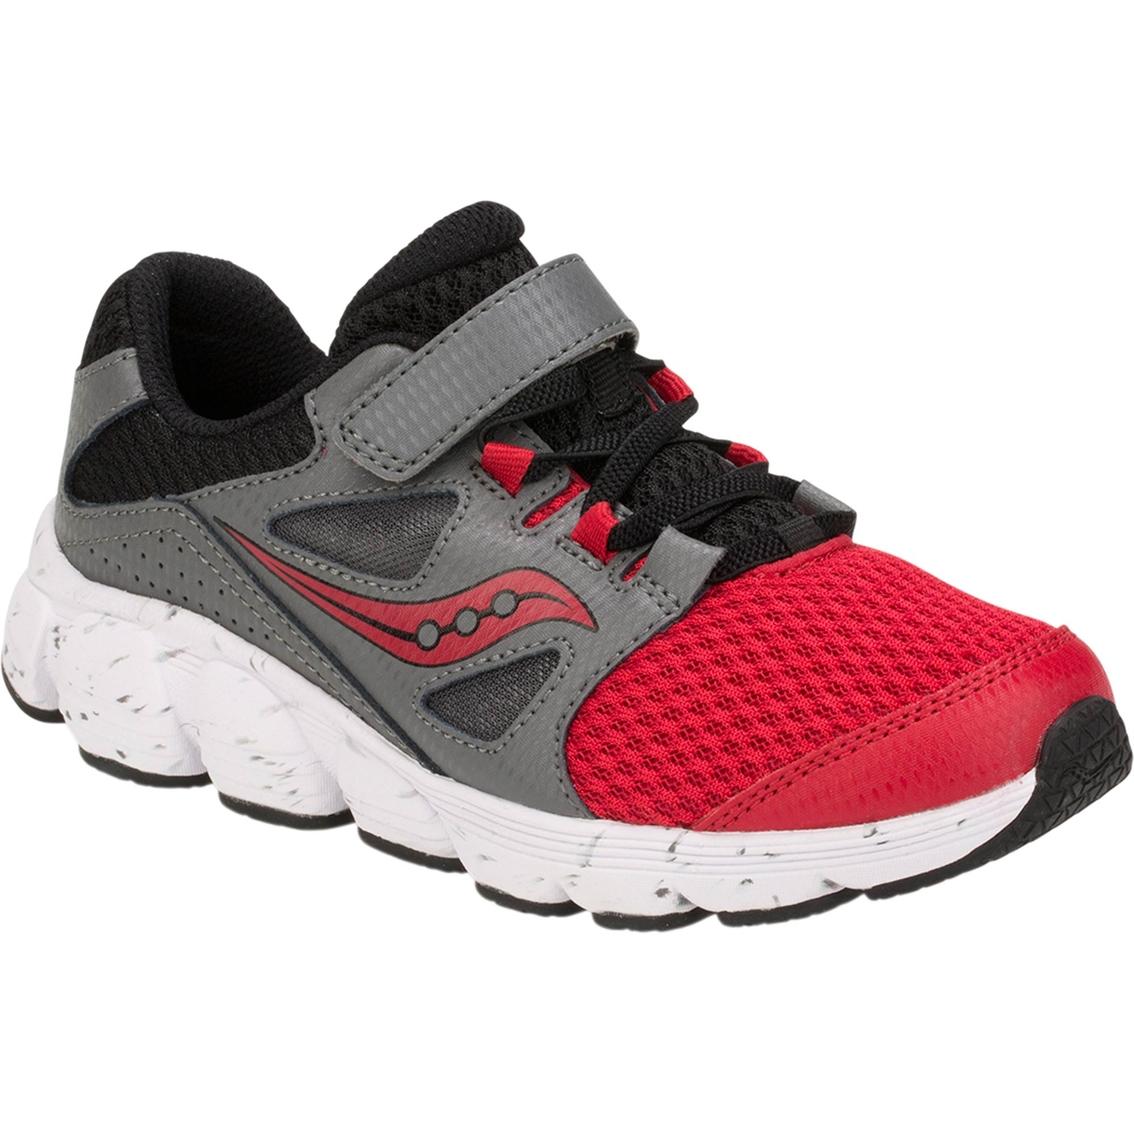 4f8ecf149da3 Saucony Boys Kotaro 4 A c Sneakers